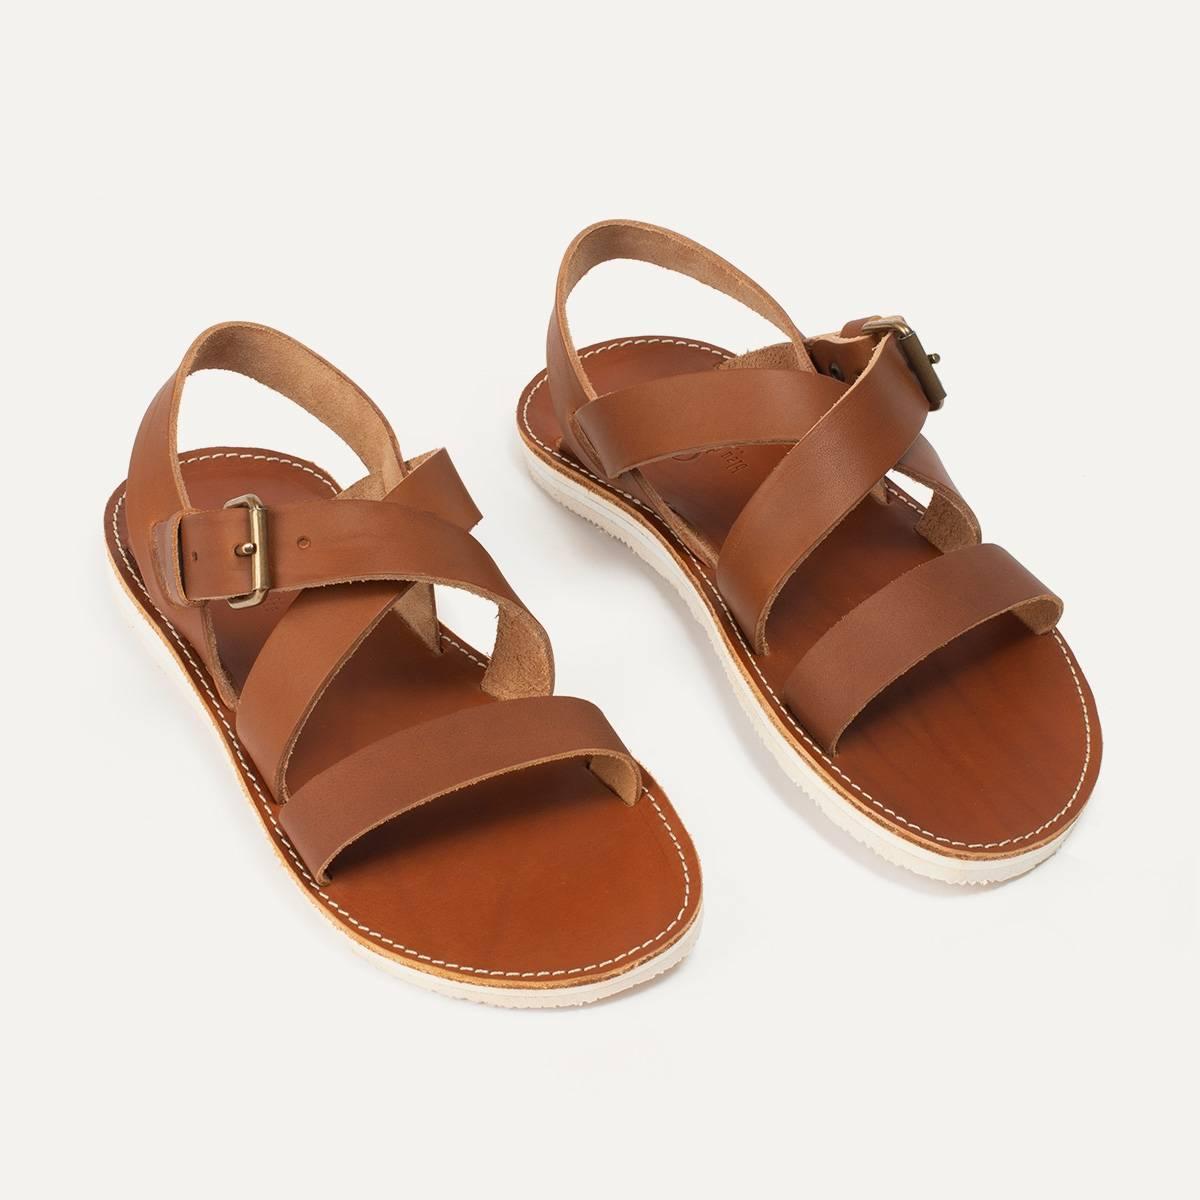 Iwate leather sandals - Pain Brûlé (image n°5)